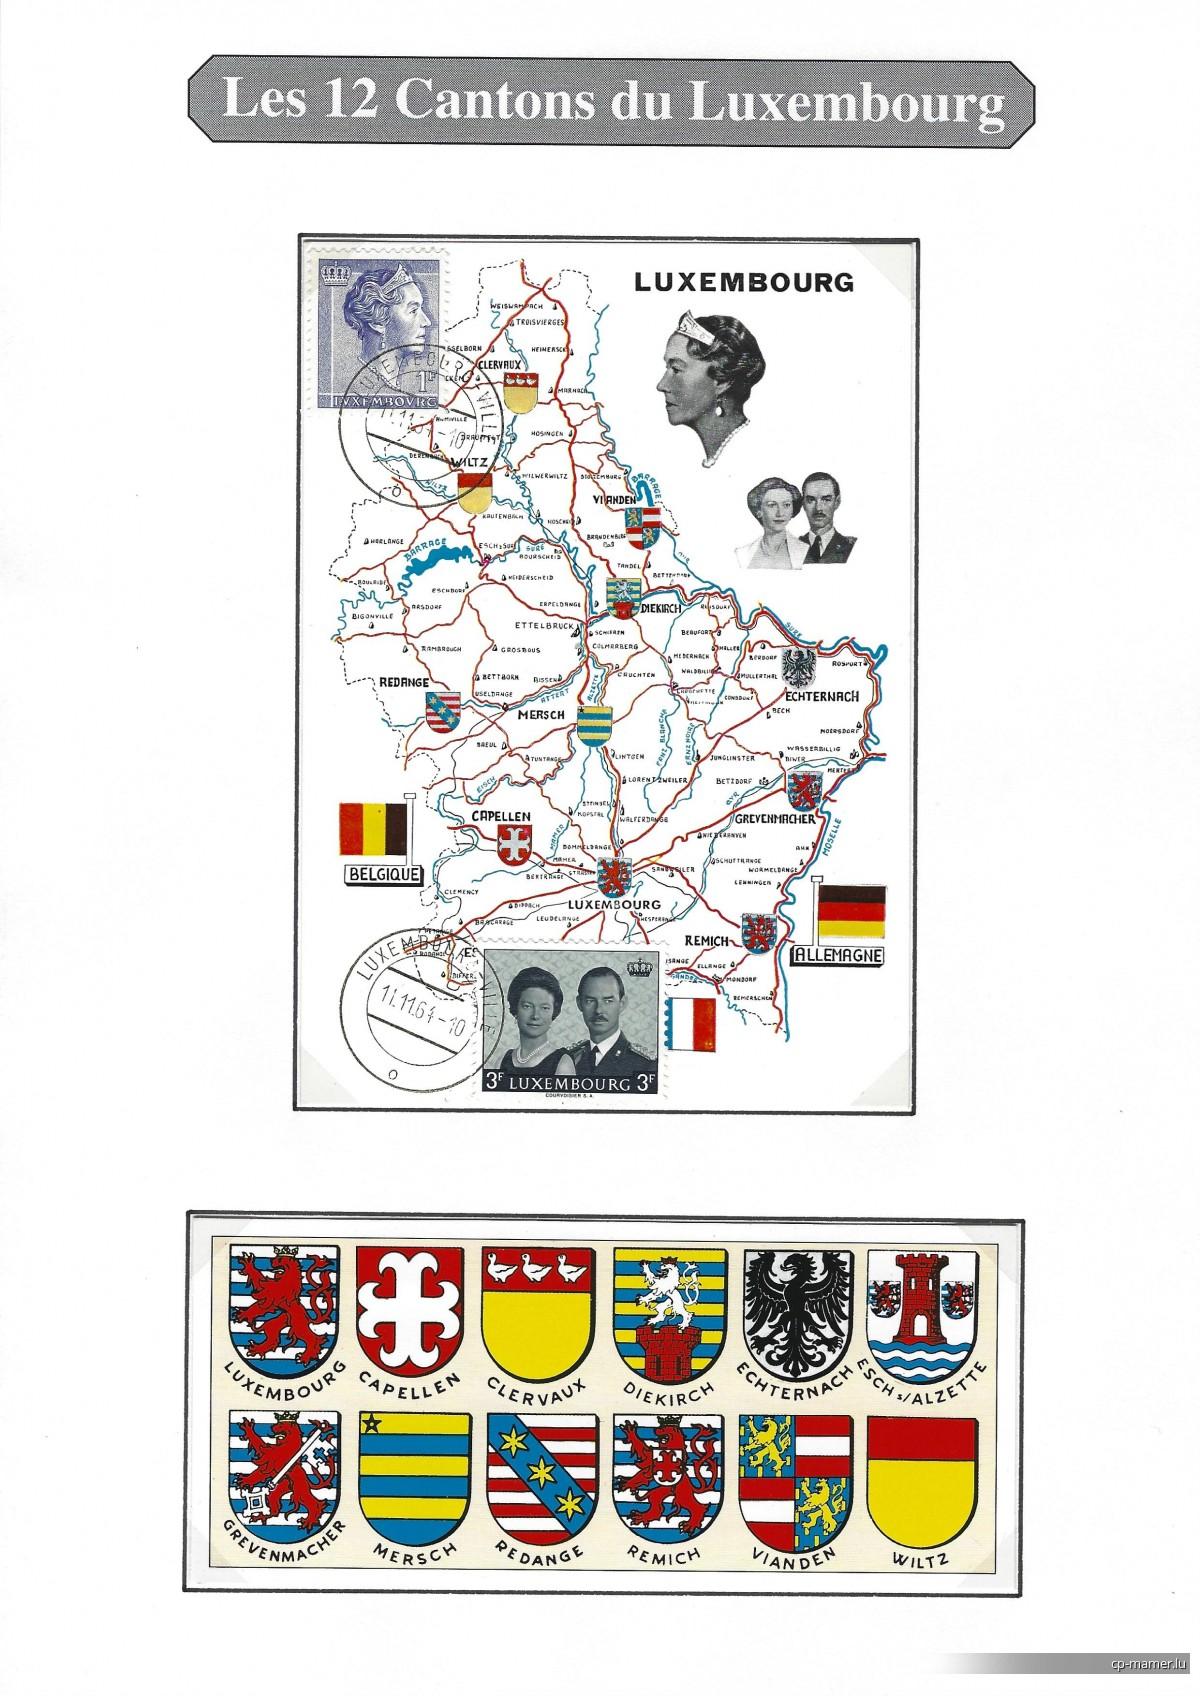 Les 12 Cantons du Luxembourg